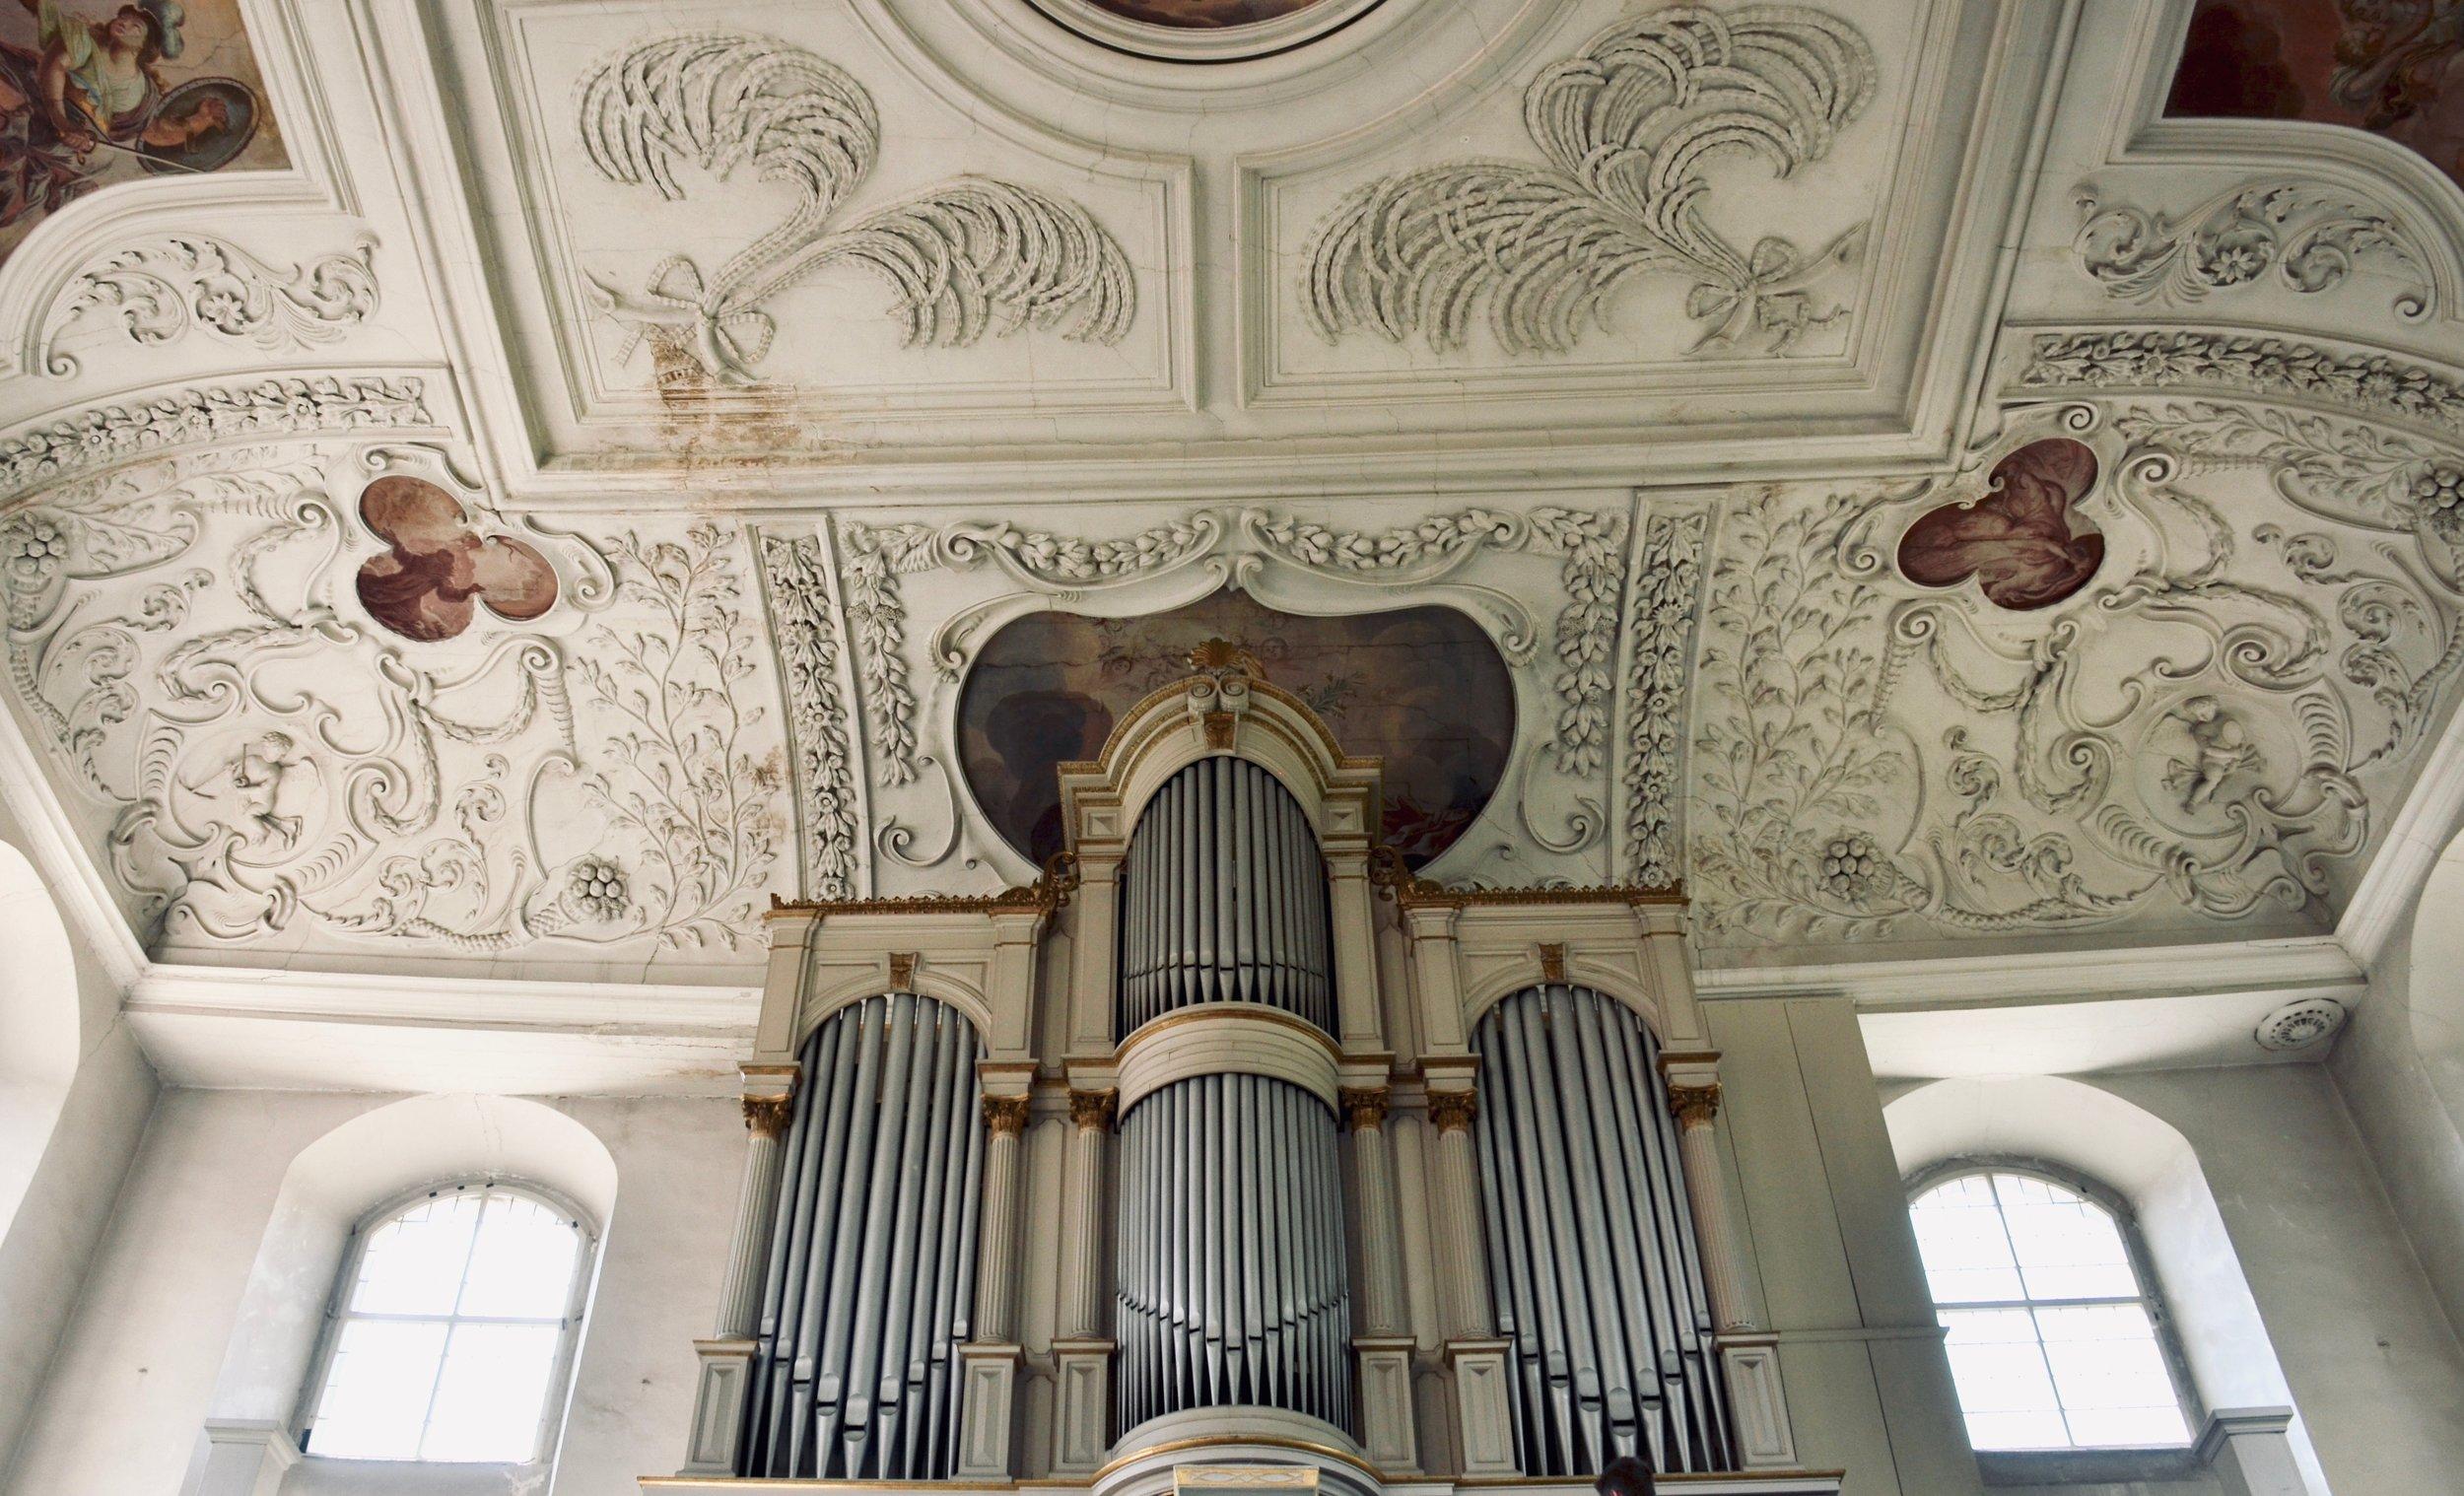 1869 Ladegast Organ, Marien-Magdalenen-Kirche, Naumburg.